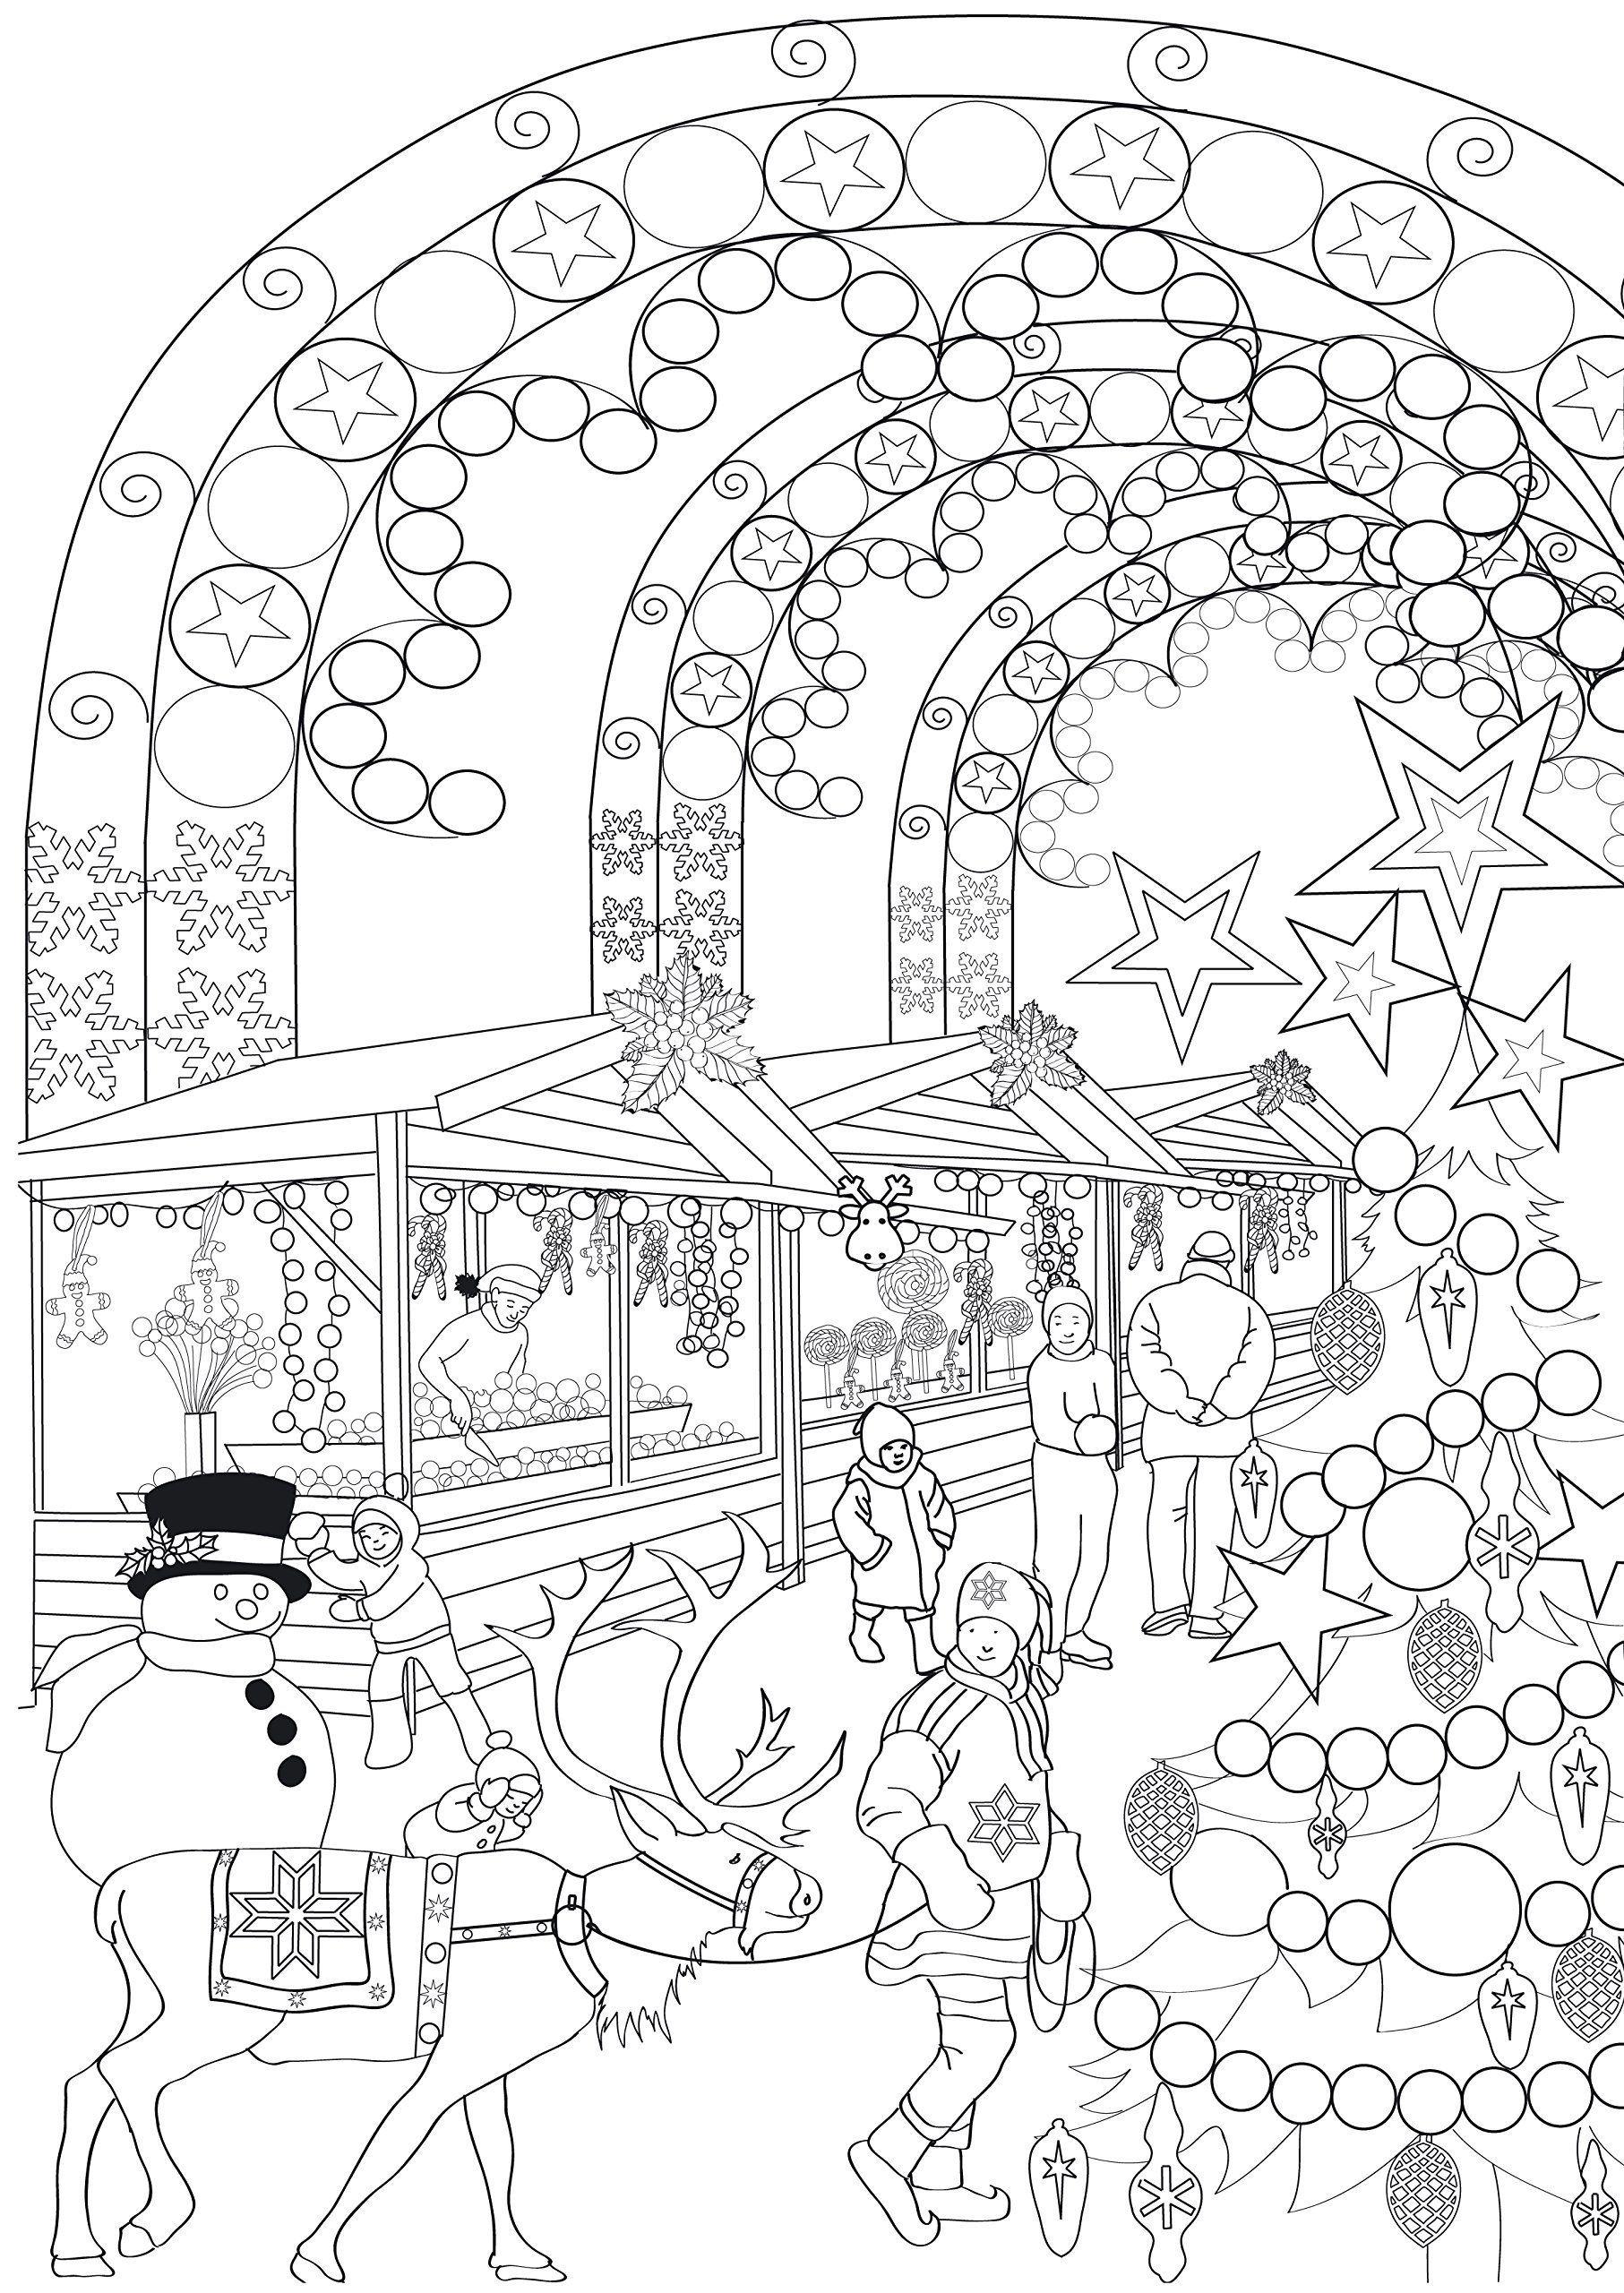 Antistress noel coloring page | Ausmalbilder, Ausmalbilder